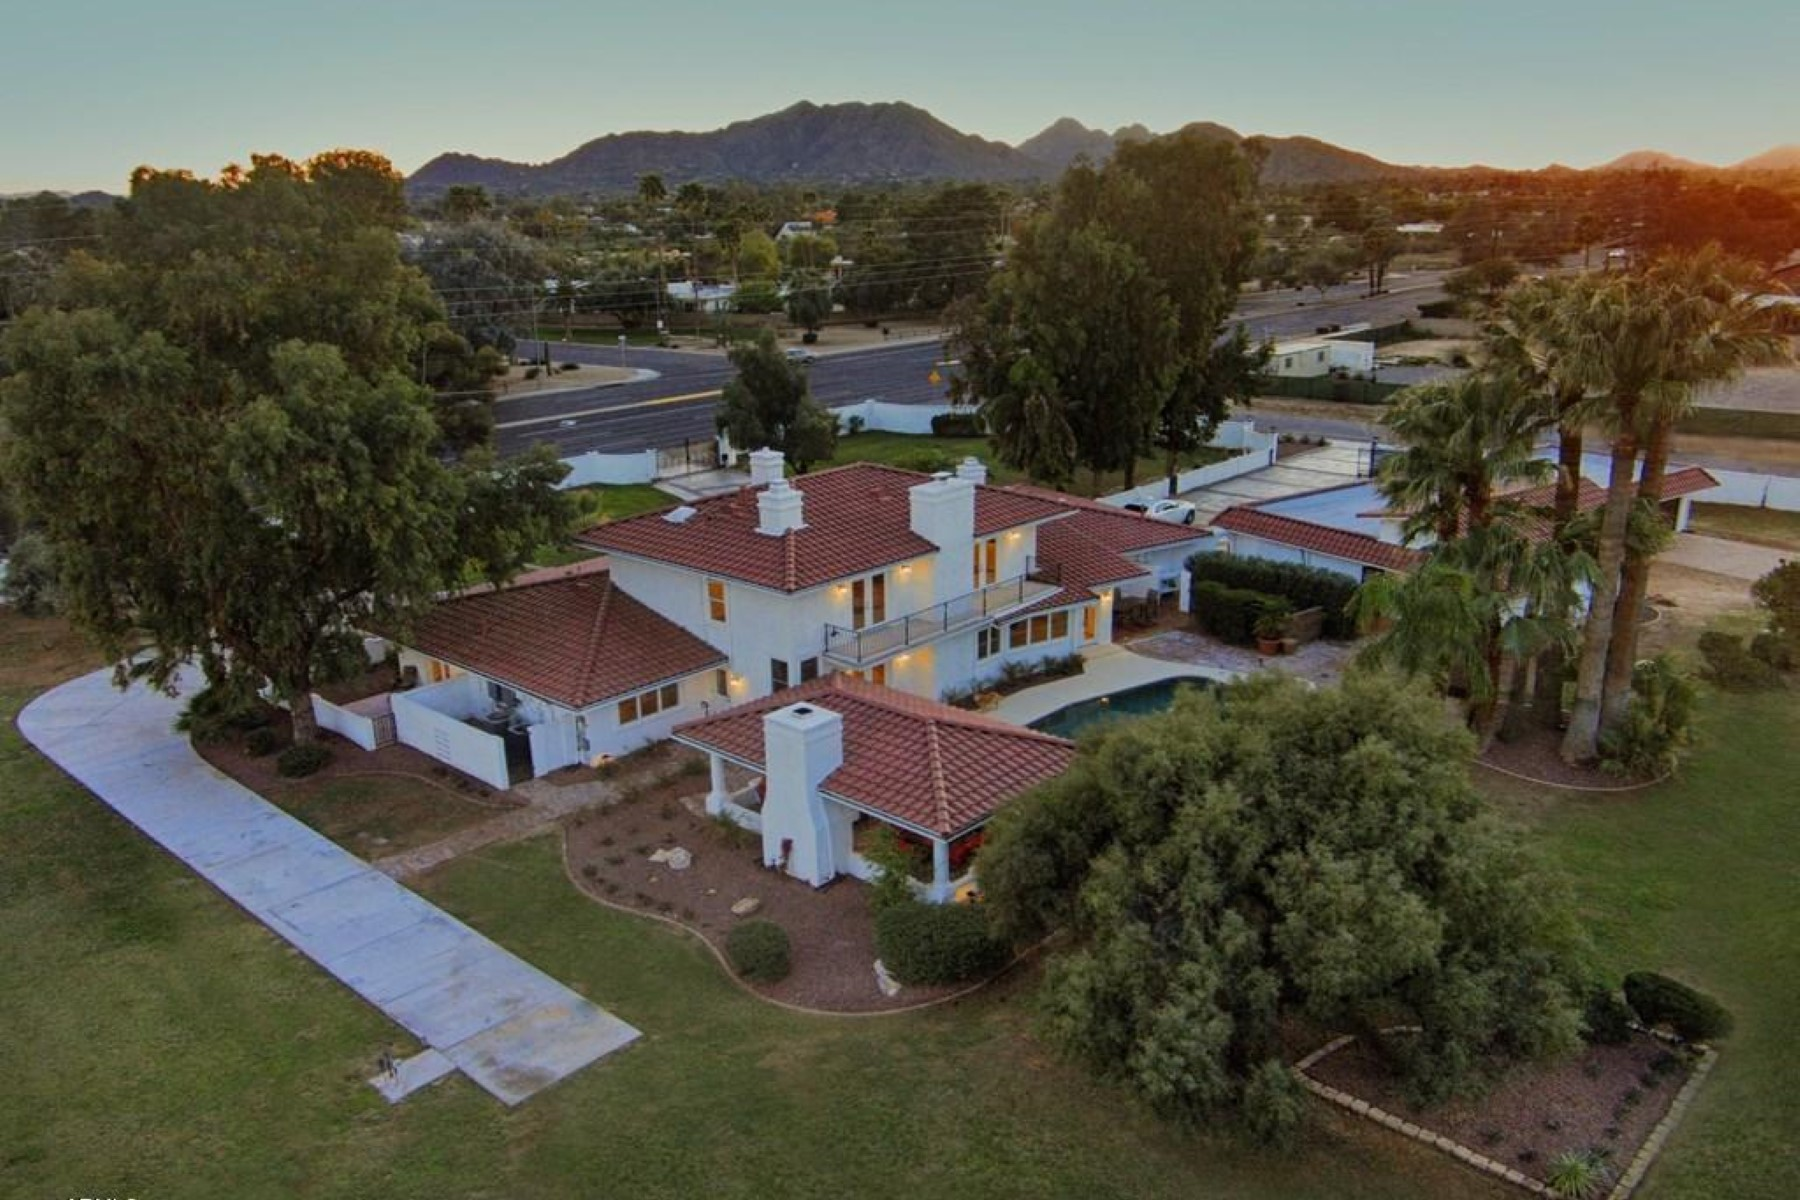 Casa para uma família para Venda às Fabulous resort style living in the heart of Scottsdale 10601 N Montrose Way Scottsdale, Arizona 85254 Estados Unidos